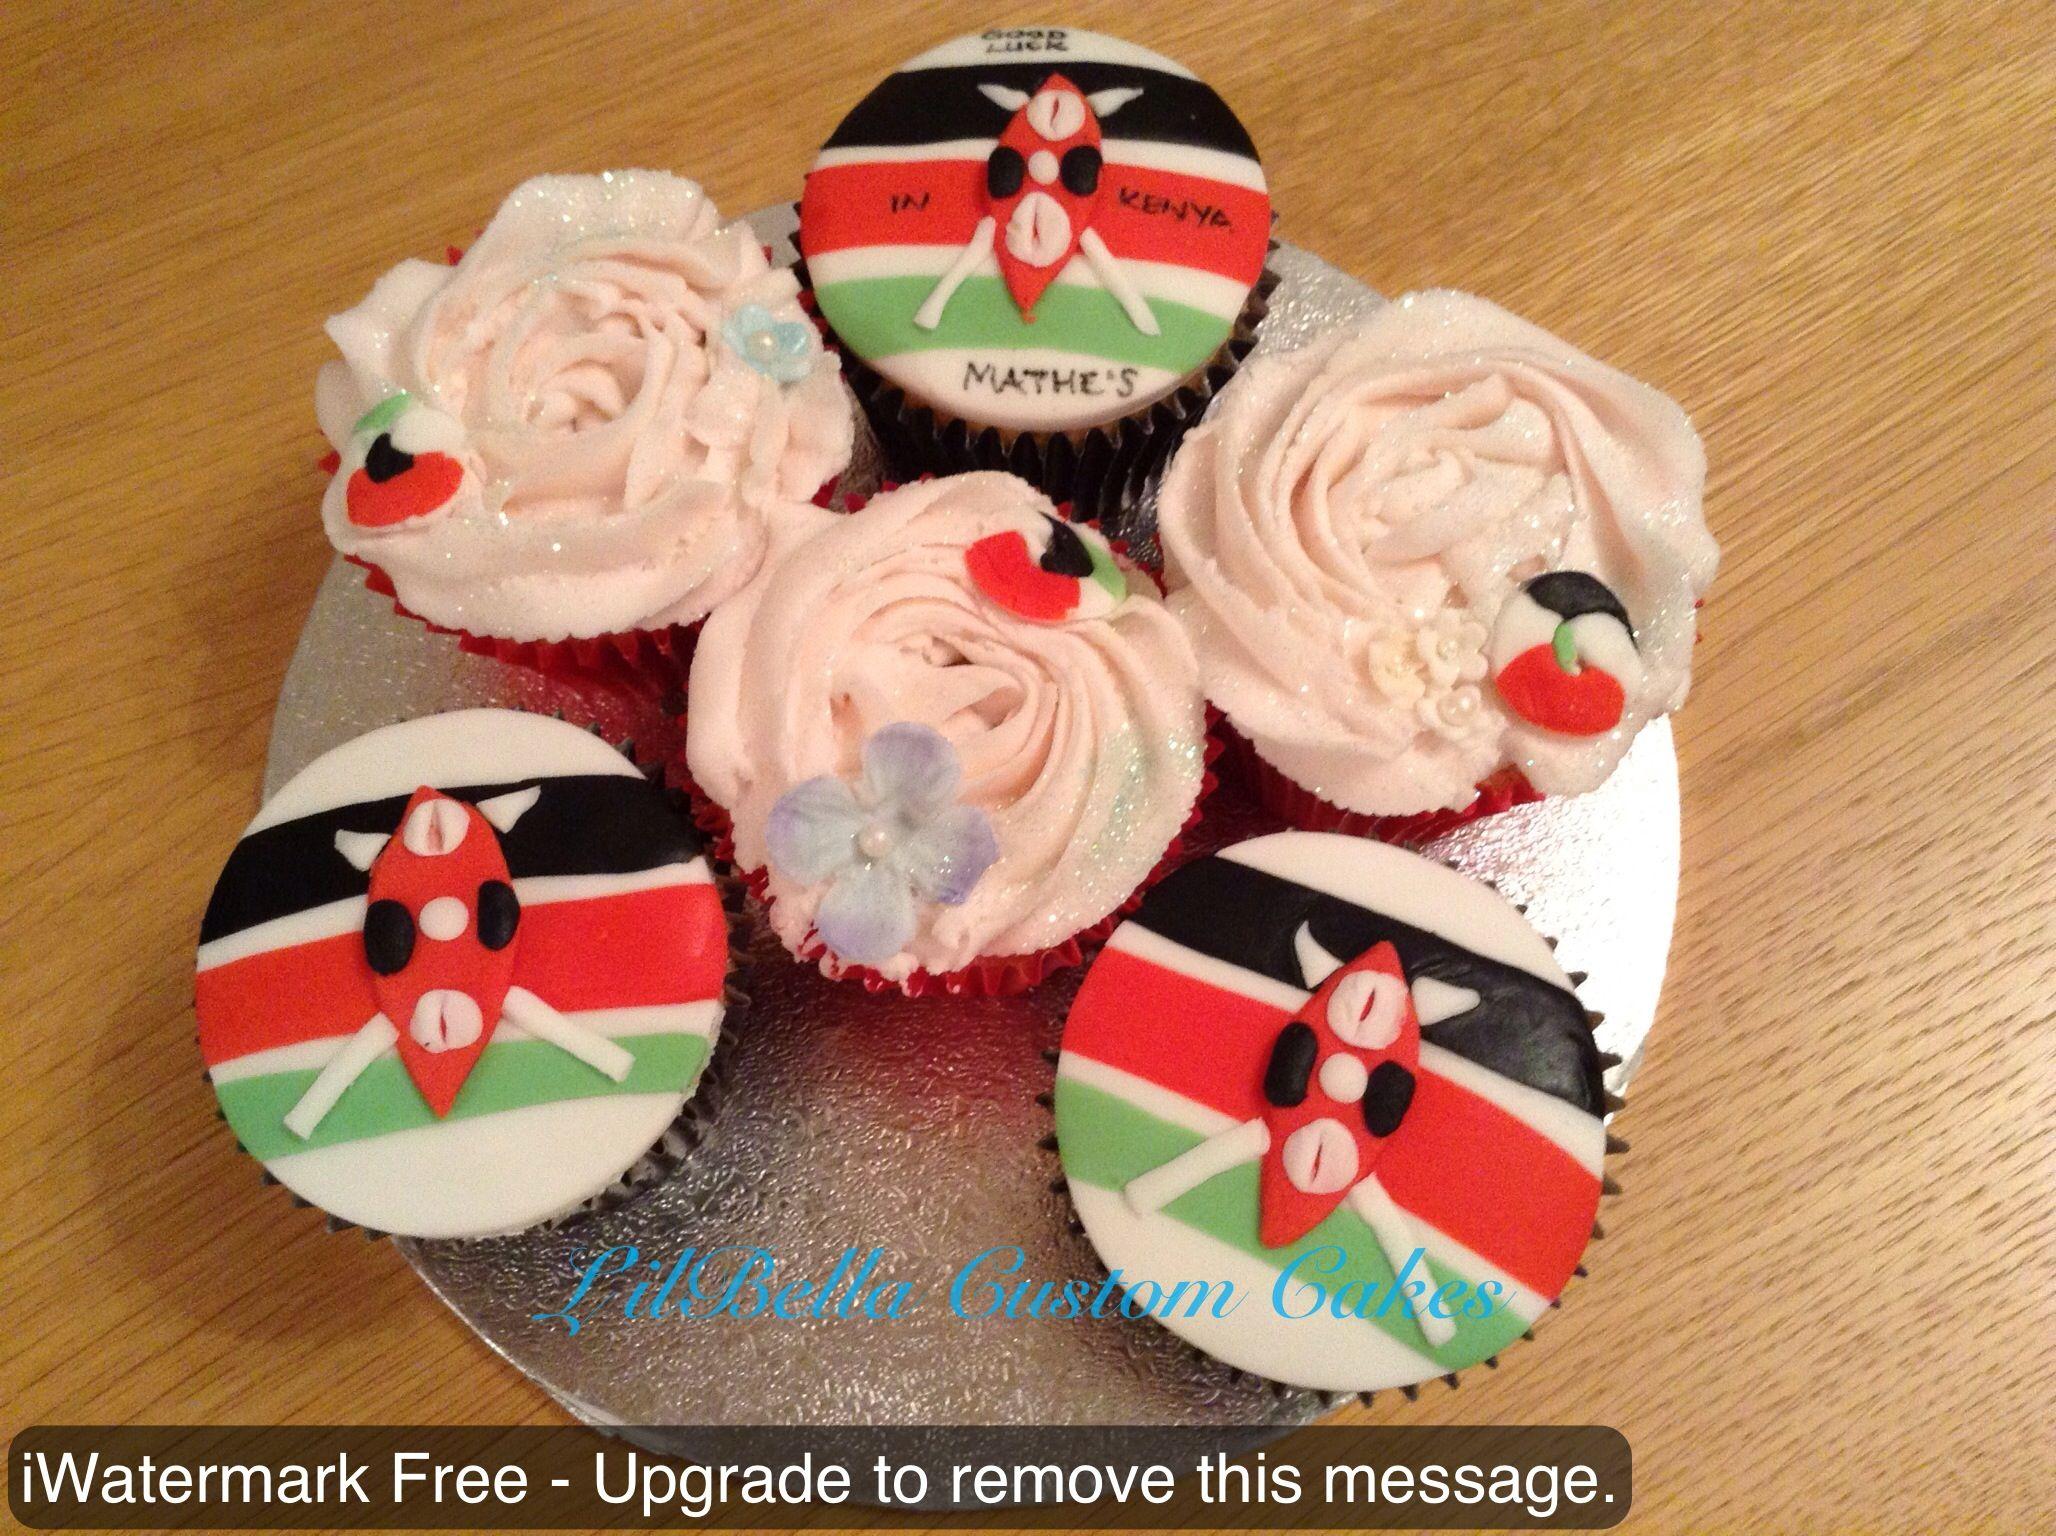 Kenyan Bon Voyage Cupcakes For The Lovely Mathe S Cupcakes